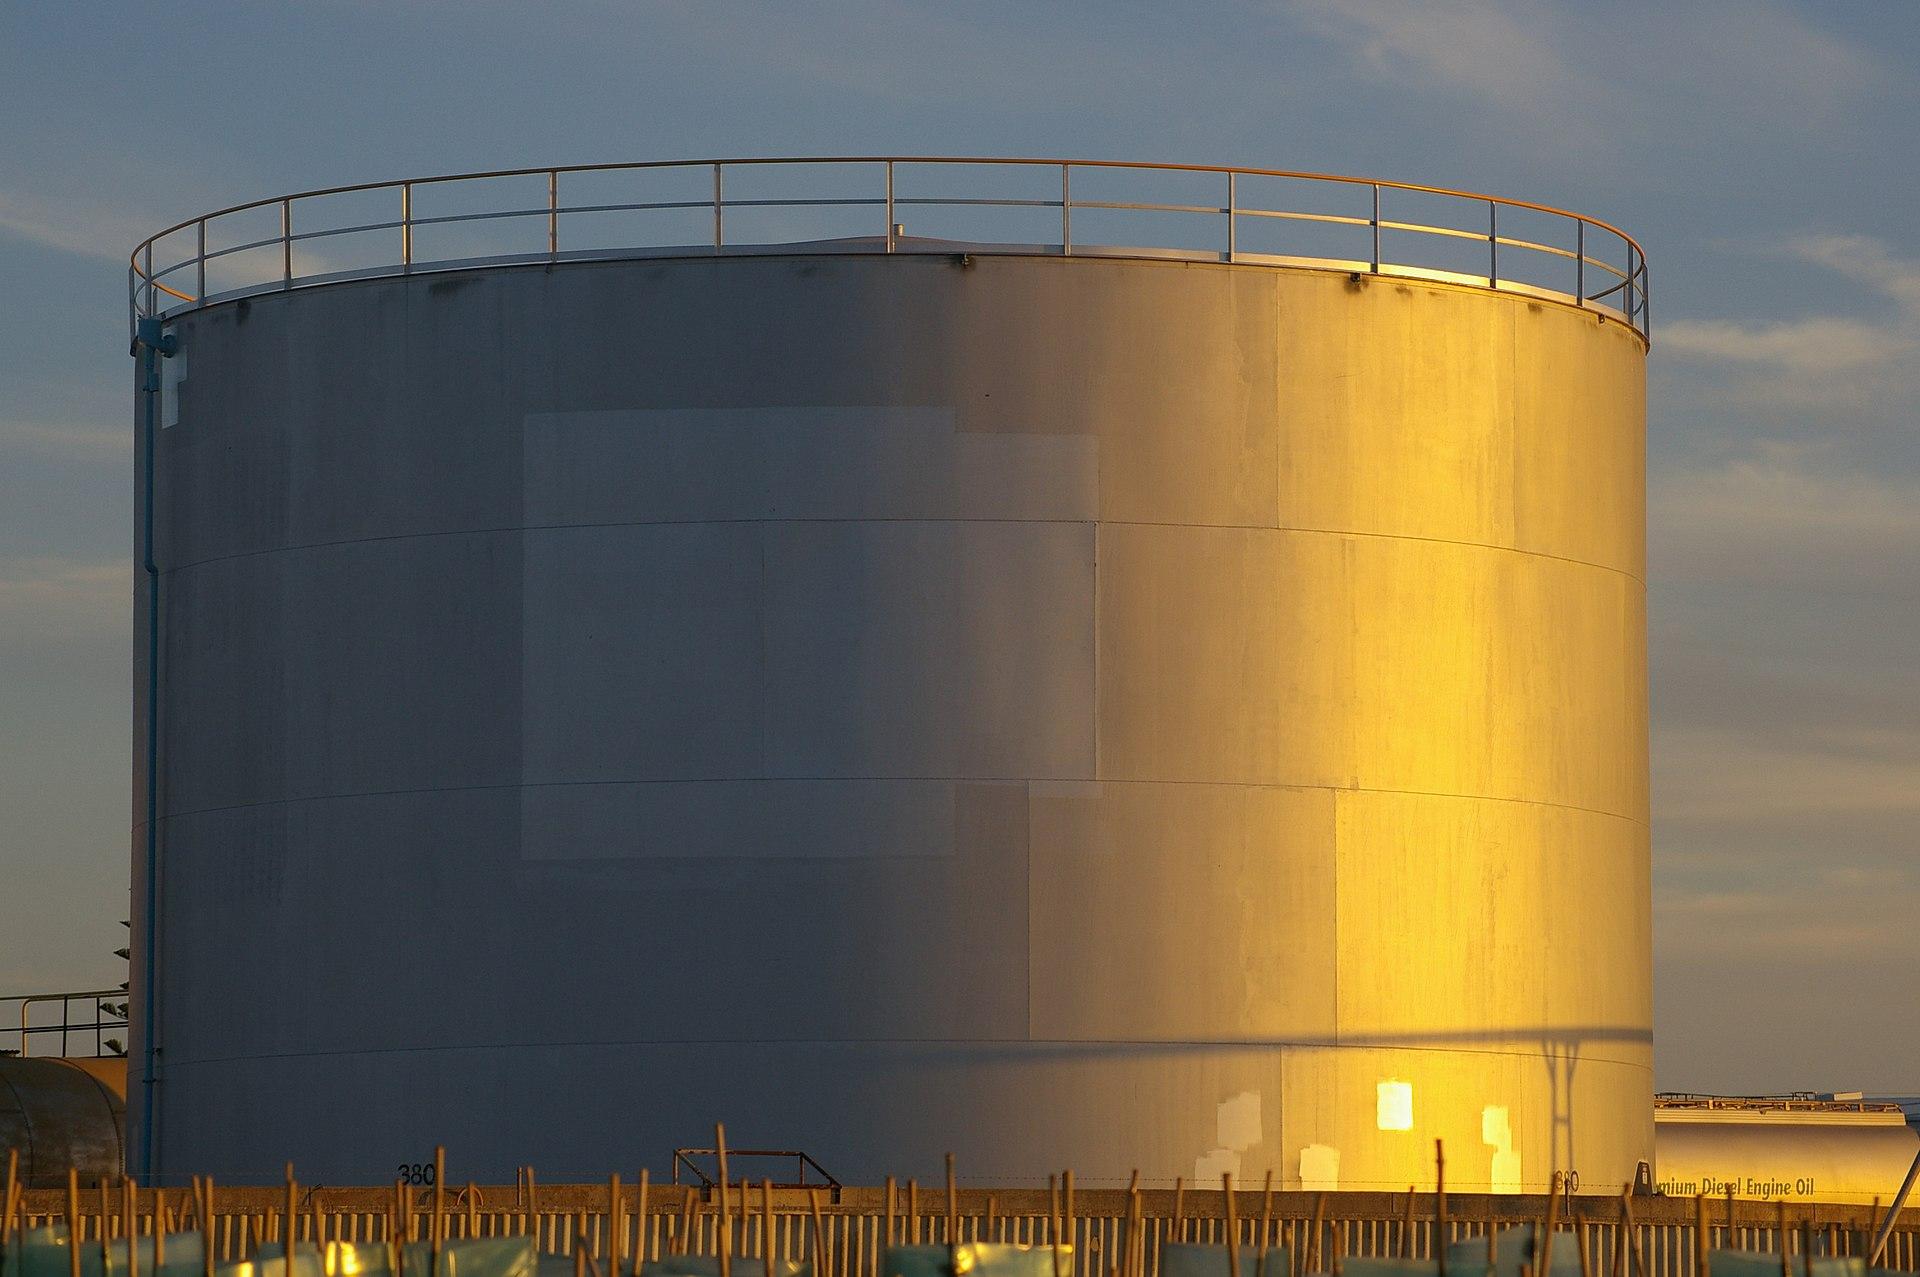 Storage tank wikipedia